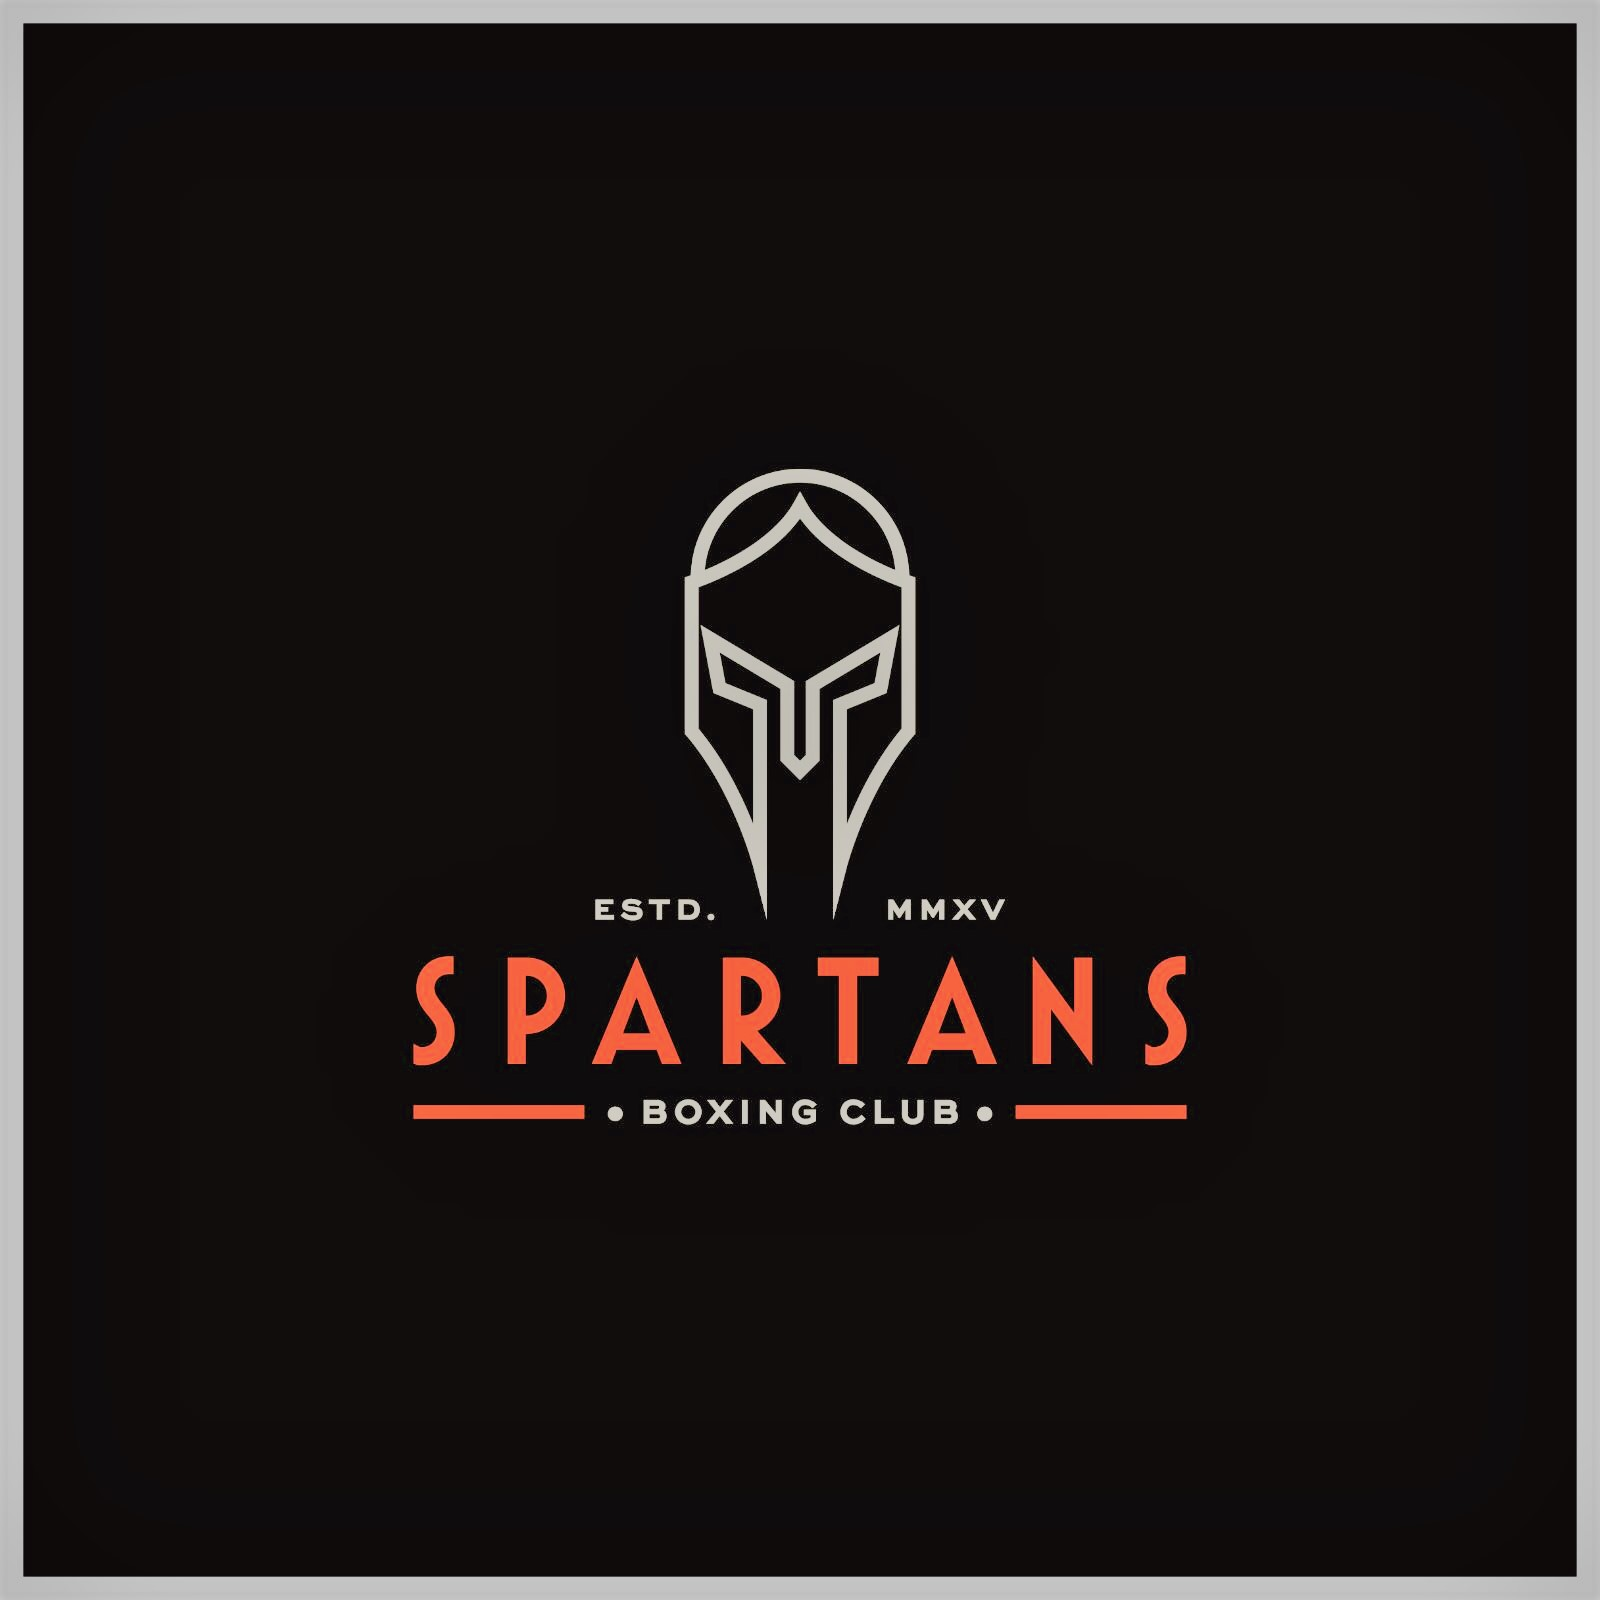 spartans boxing club